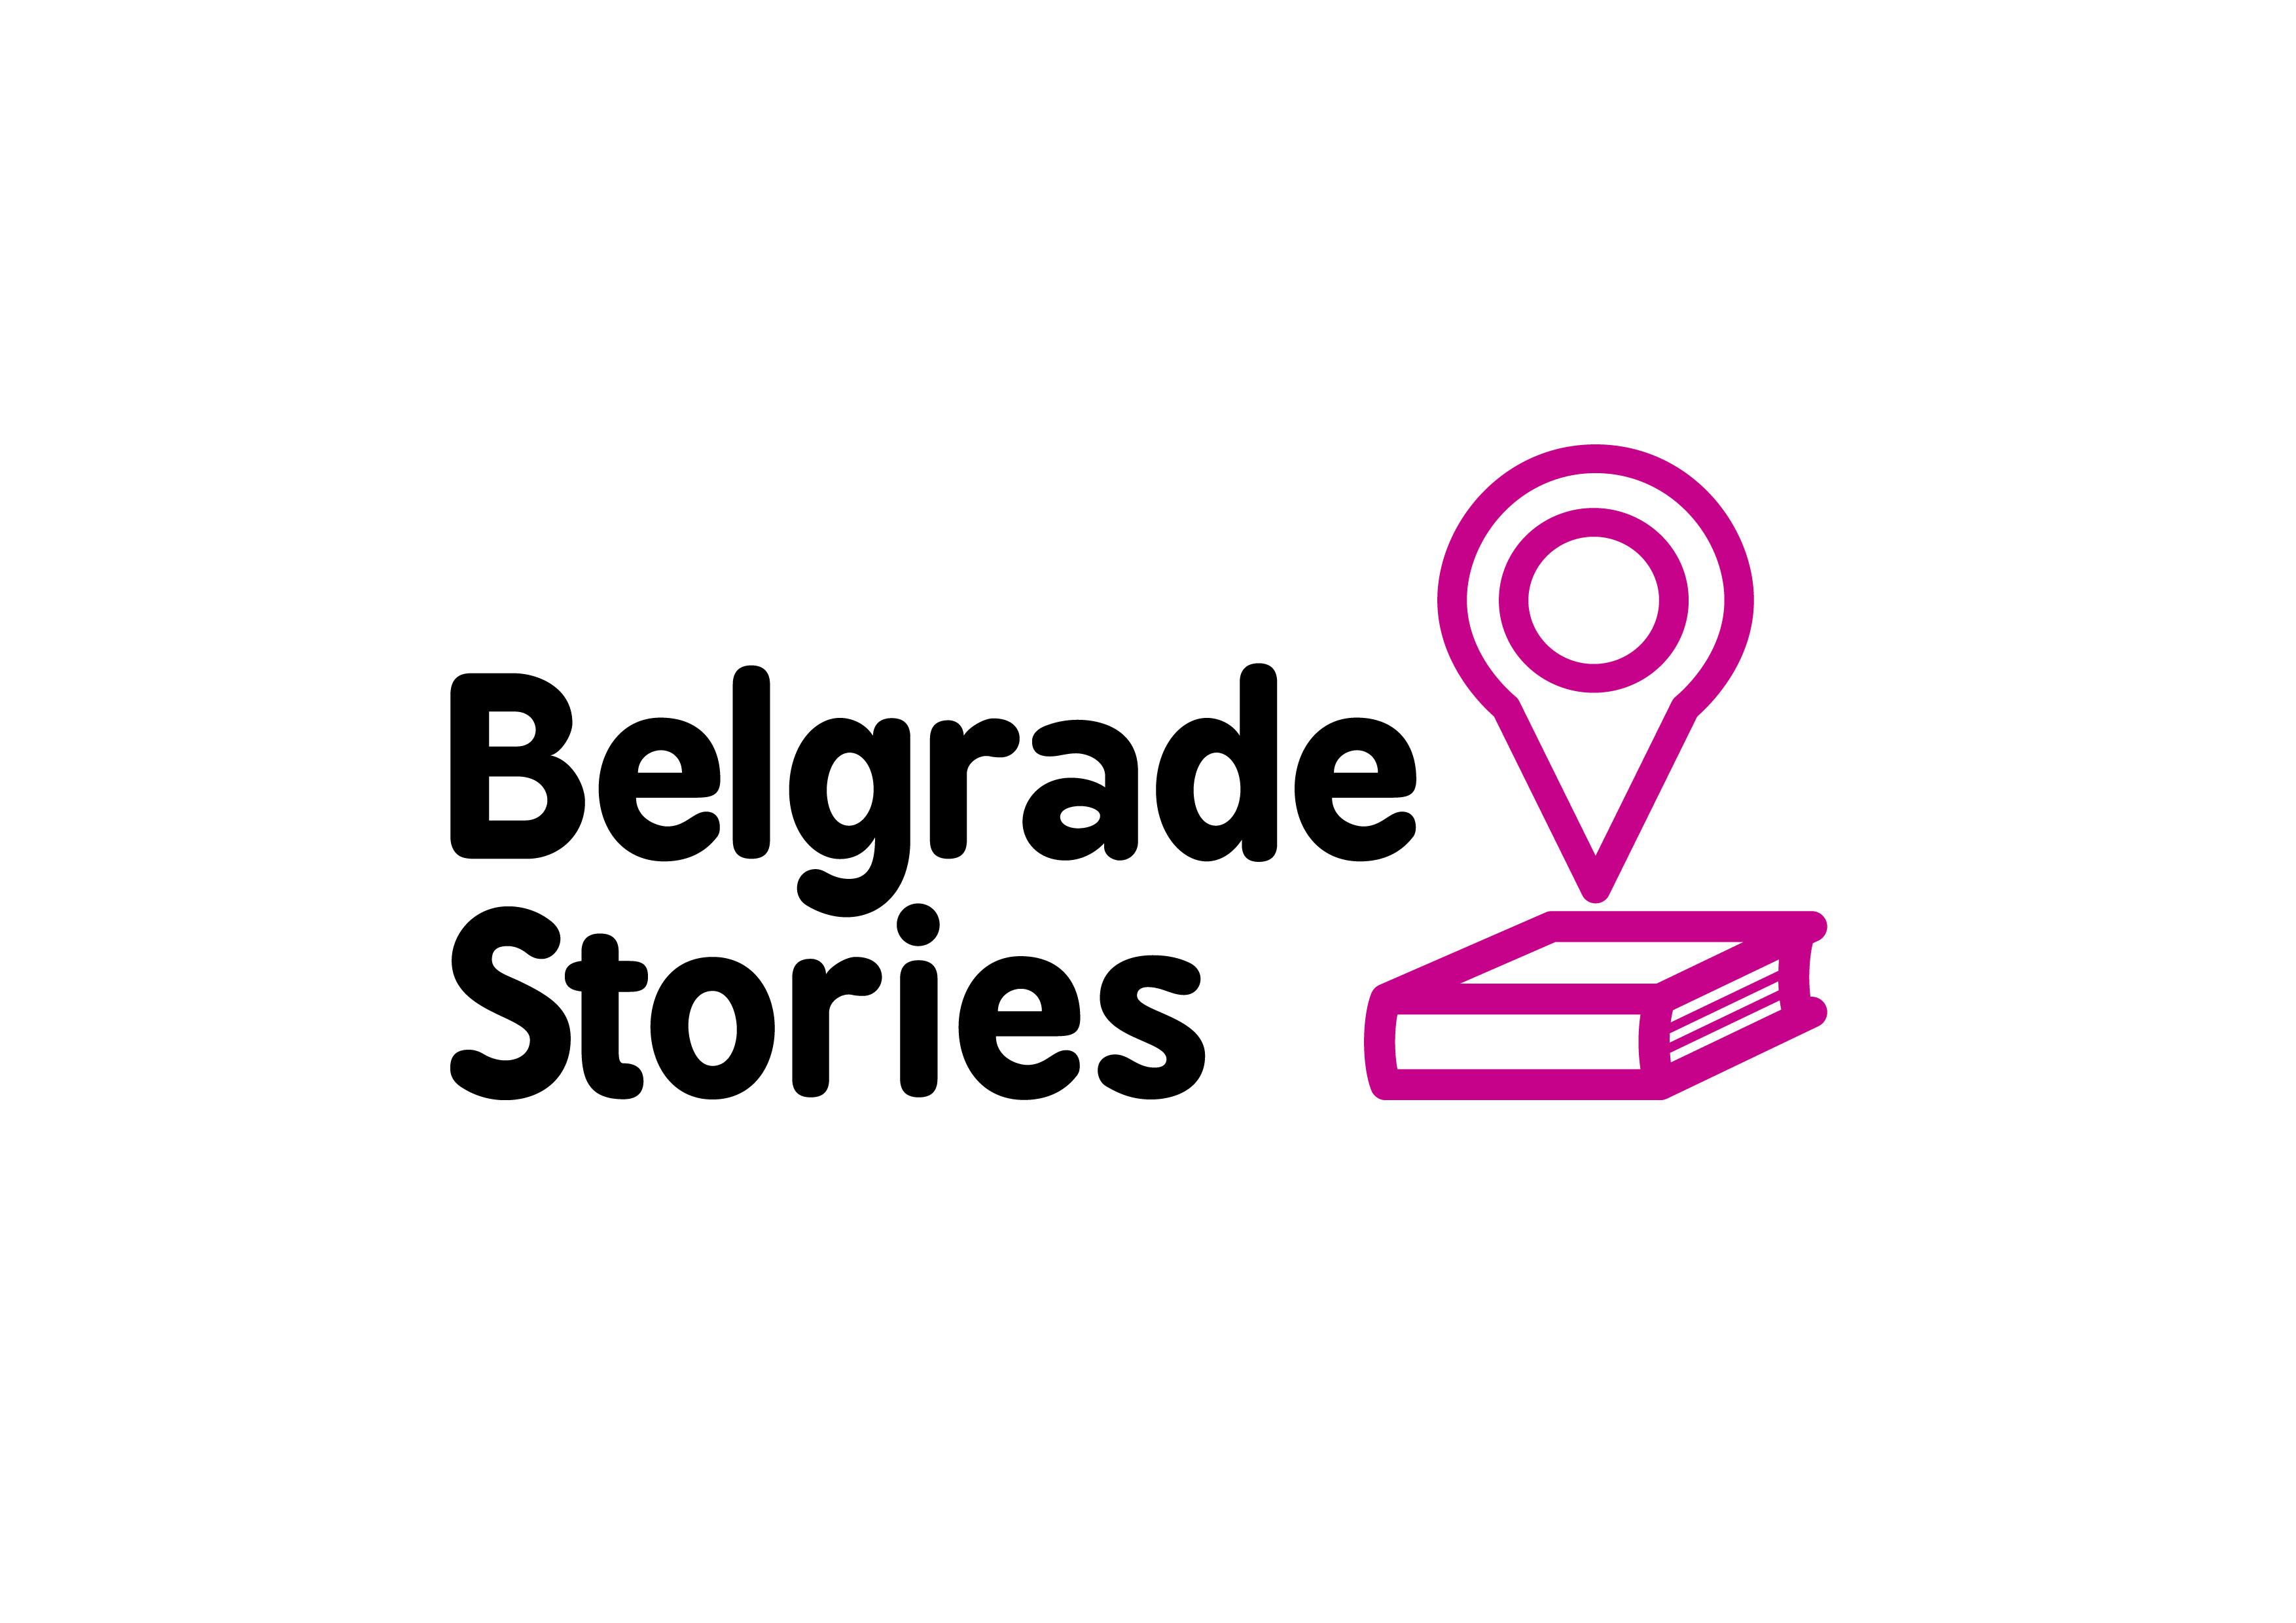 Логотип для агентства городских туров в Белграде фото f_7645893671f21551.jpg